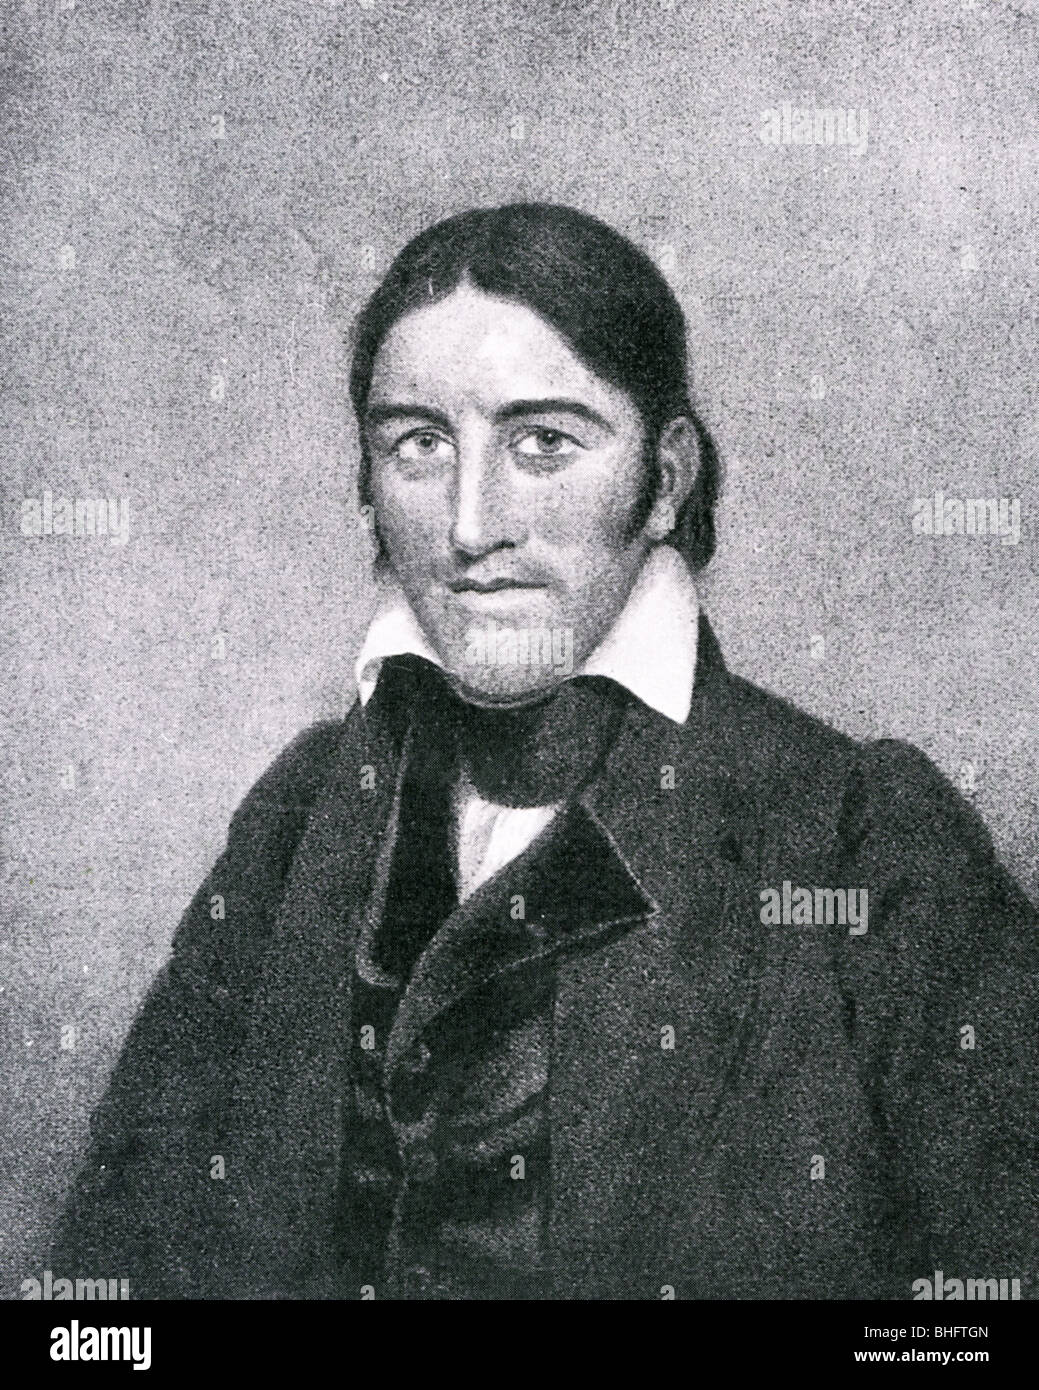 DAVY CROCKETT (1786-1836) US frontiersman - Stock Image